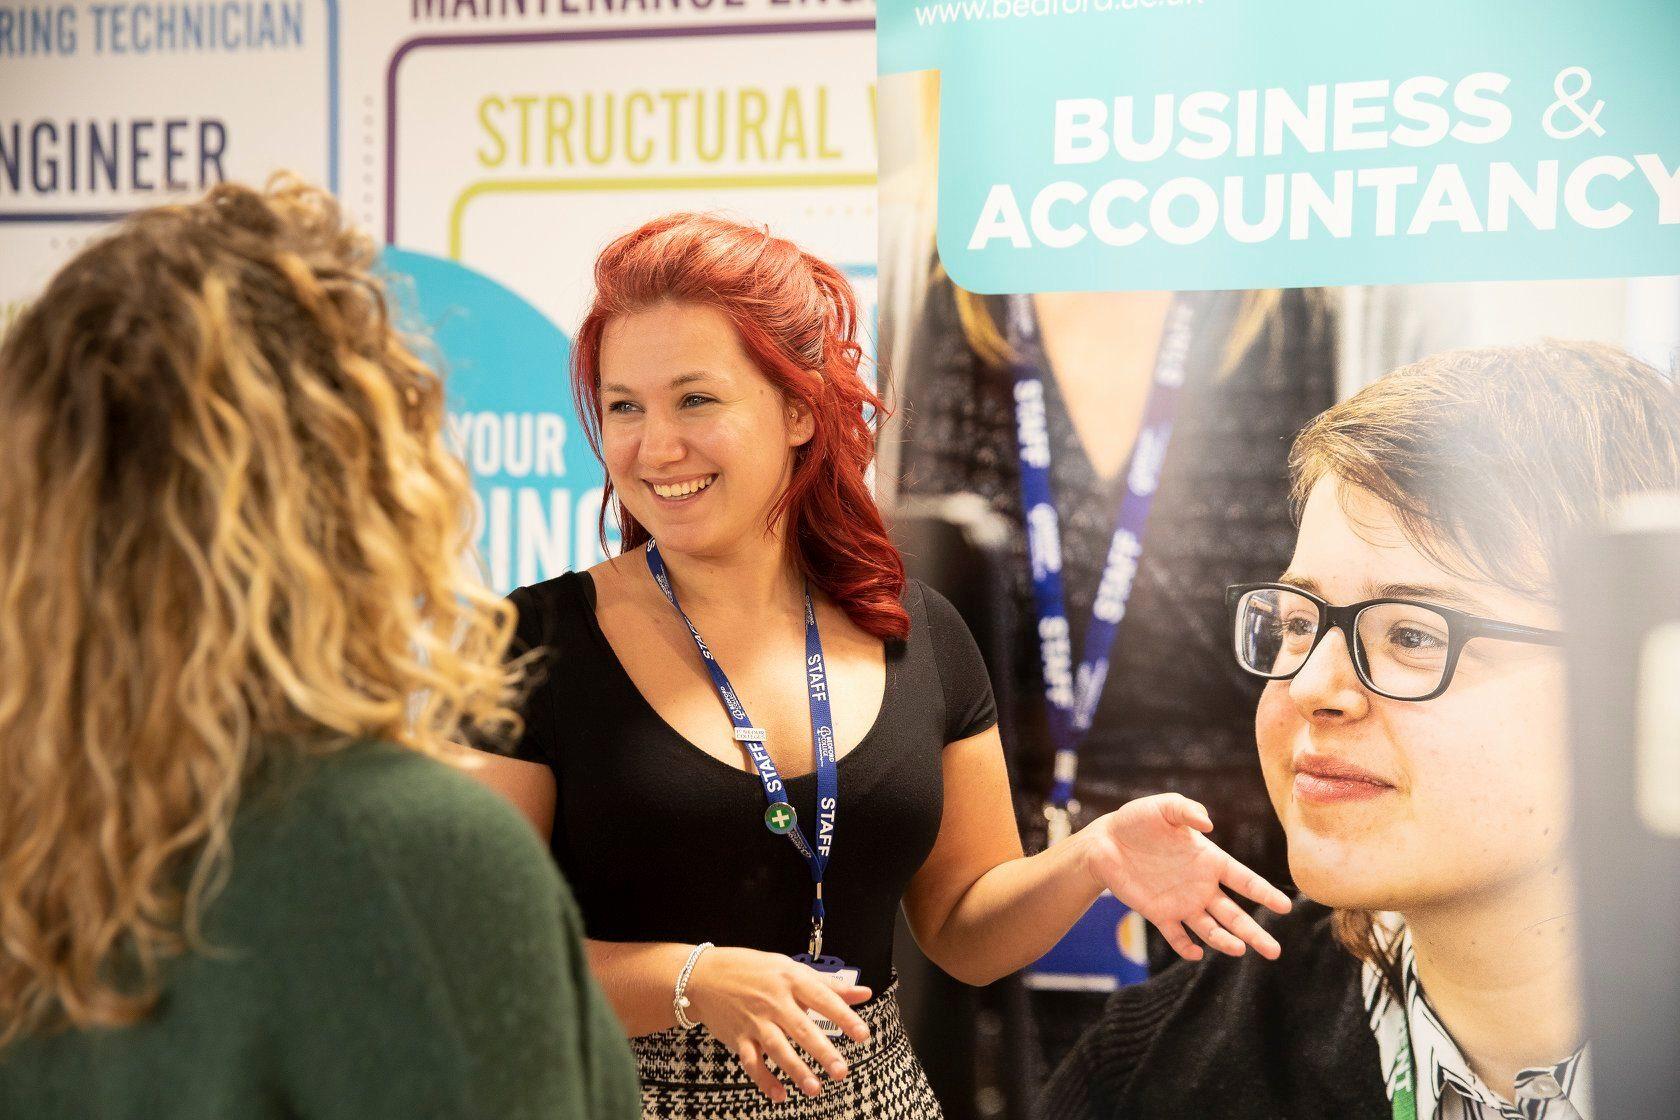 Business apprentice Bedford College